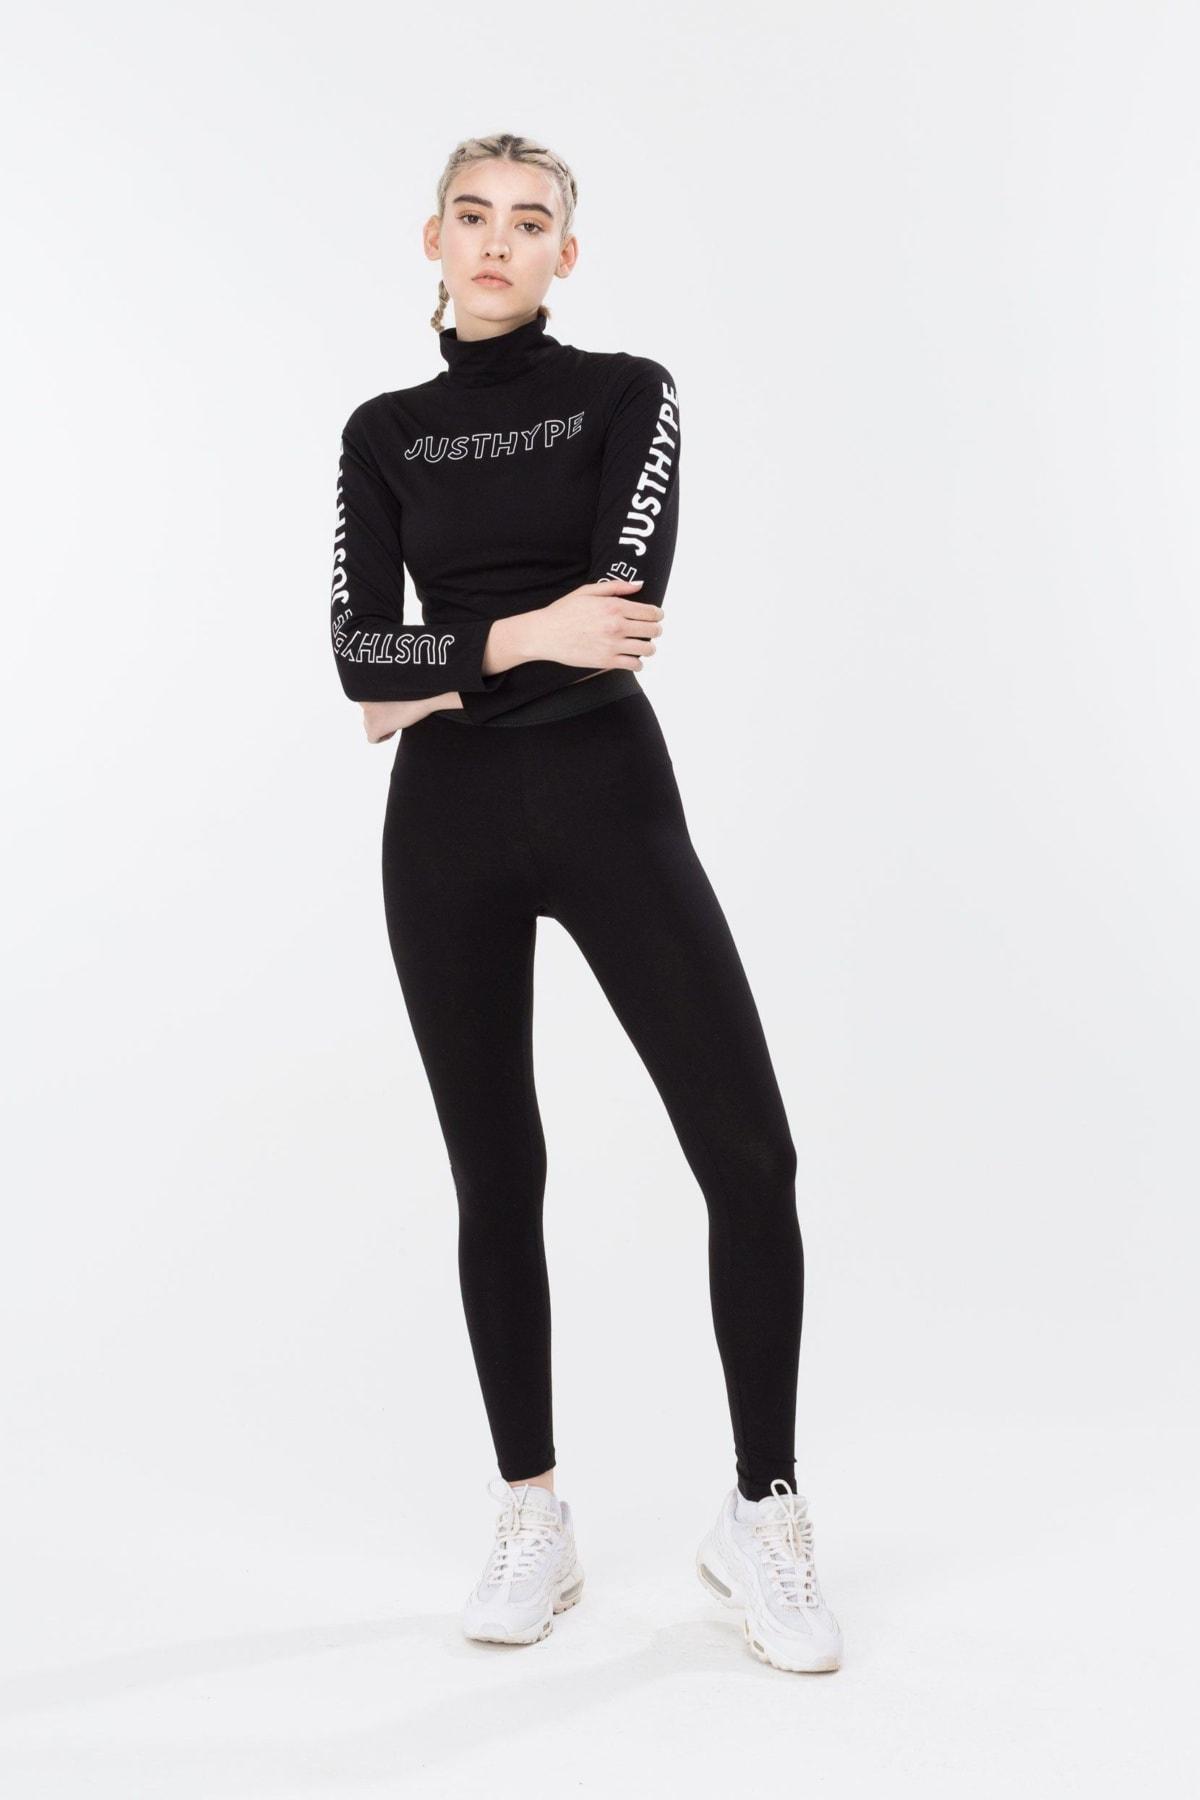 HYPE Black/White High Neck Women's L/S Crop Top